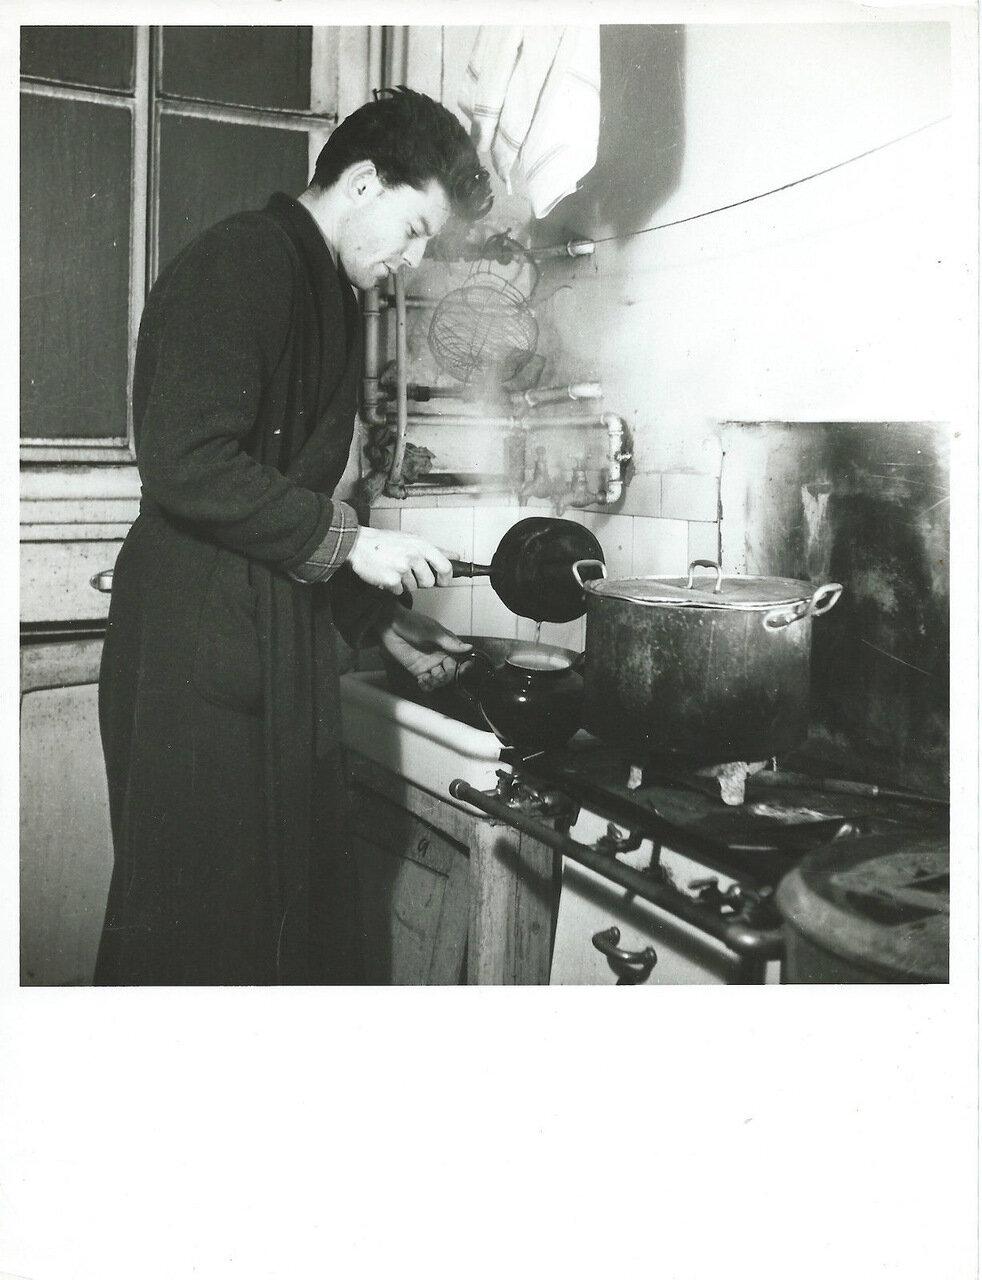 Жерар Филип 23 лет в своей квартире на  Сен-Жермен-де-Пре